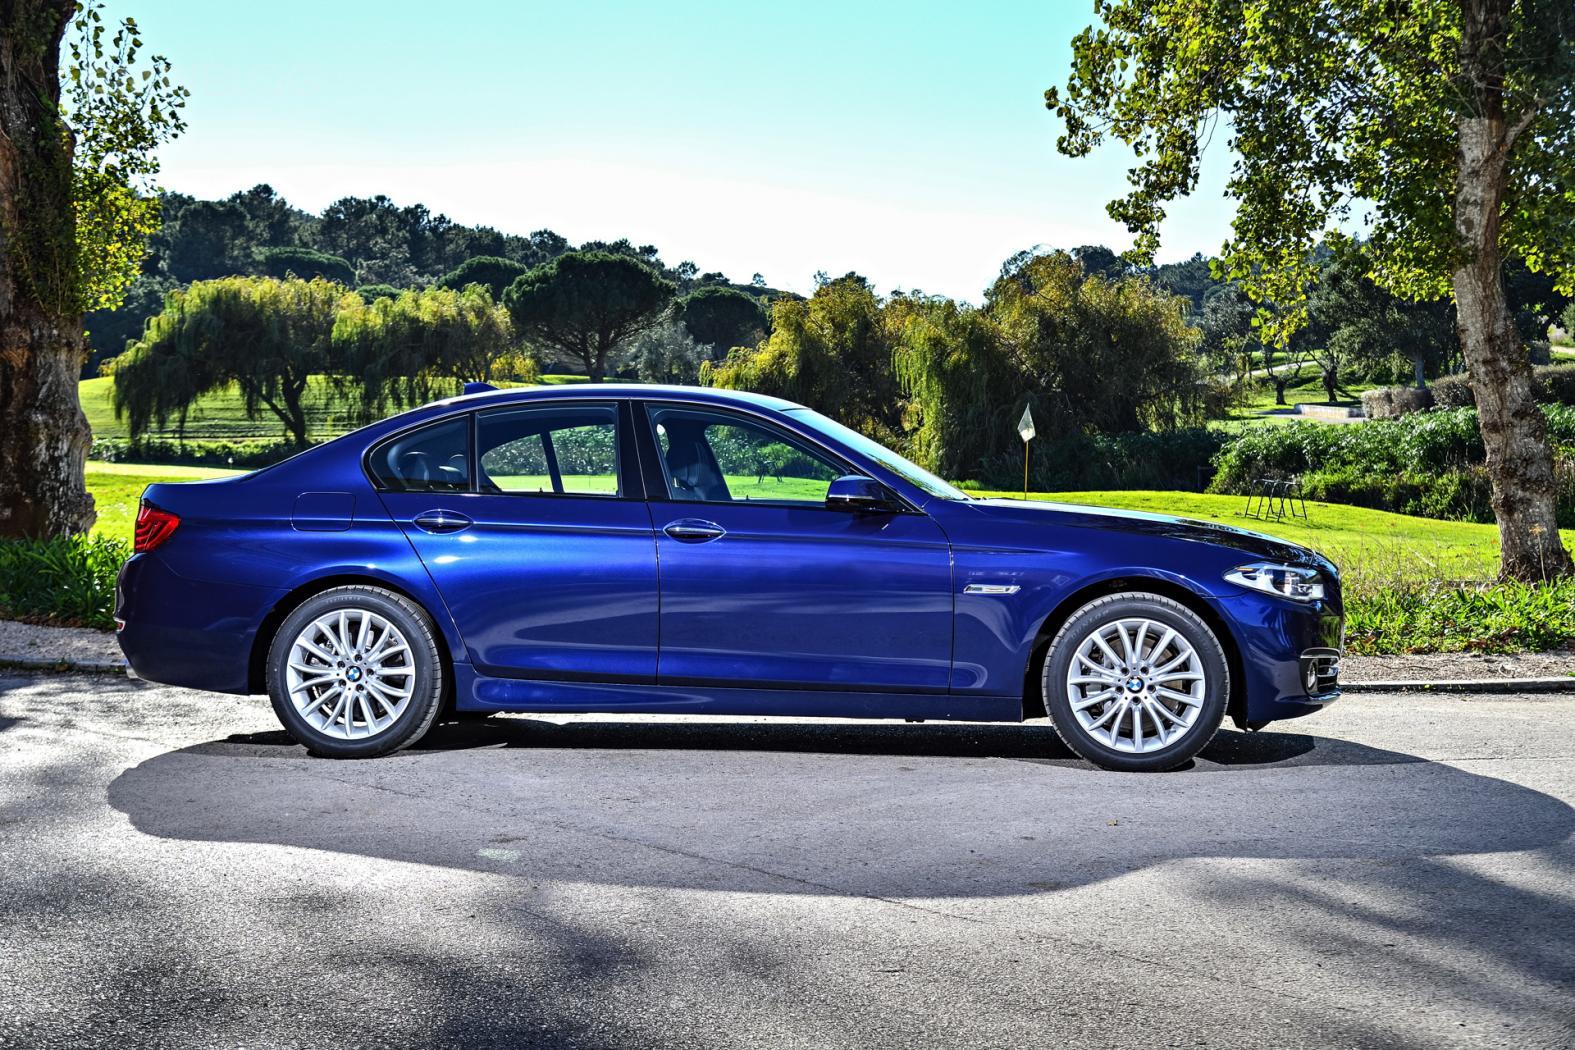 BMW-F10.jpeg